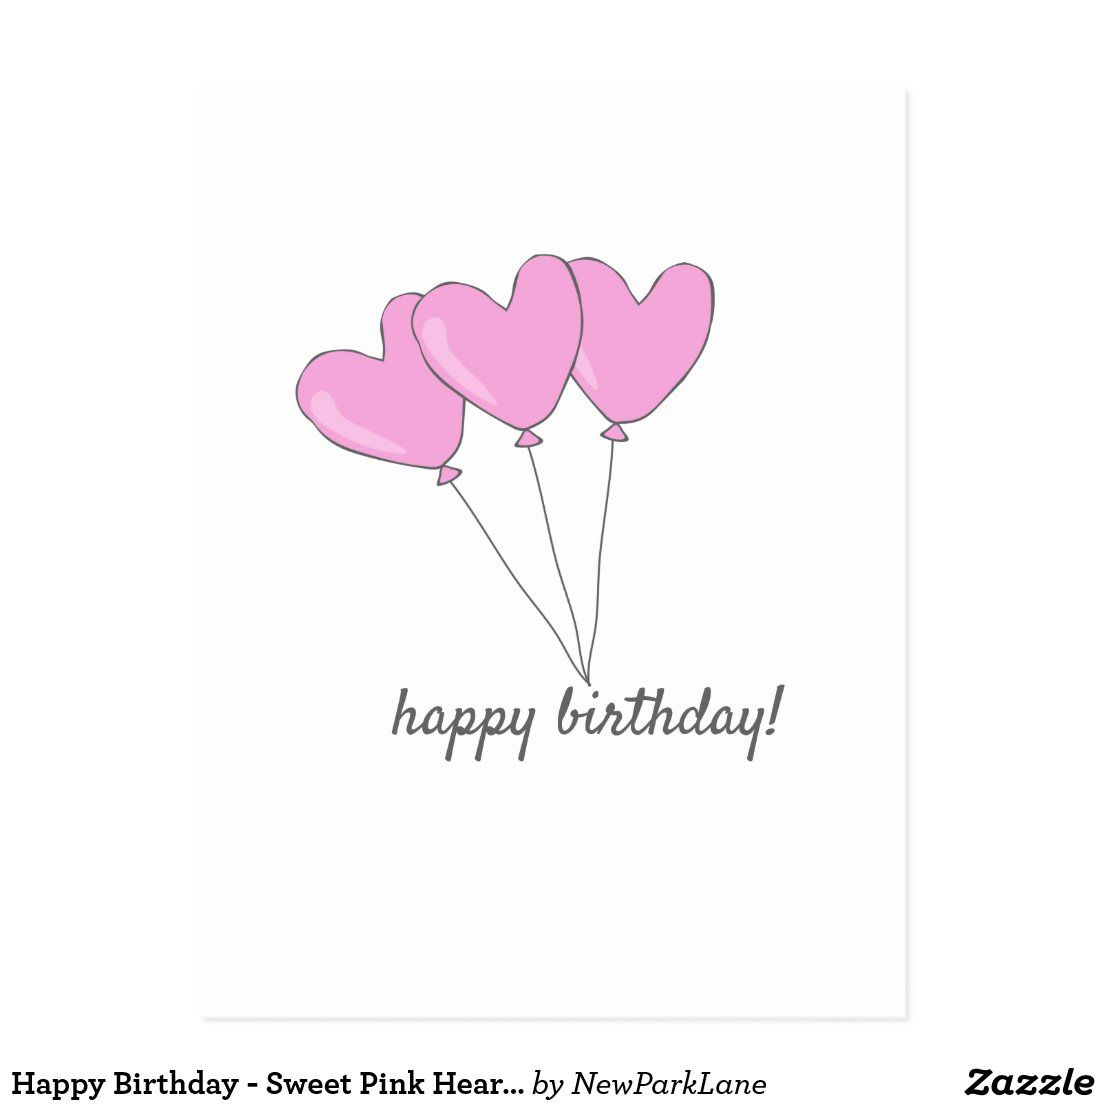 Happy Birthday – Sweet Pink Heart Shaped Balloons Postcard